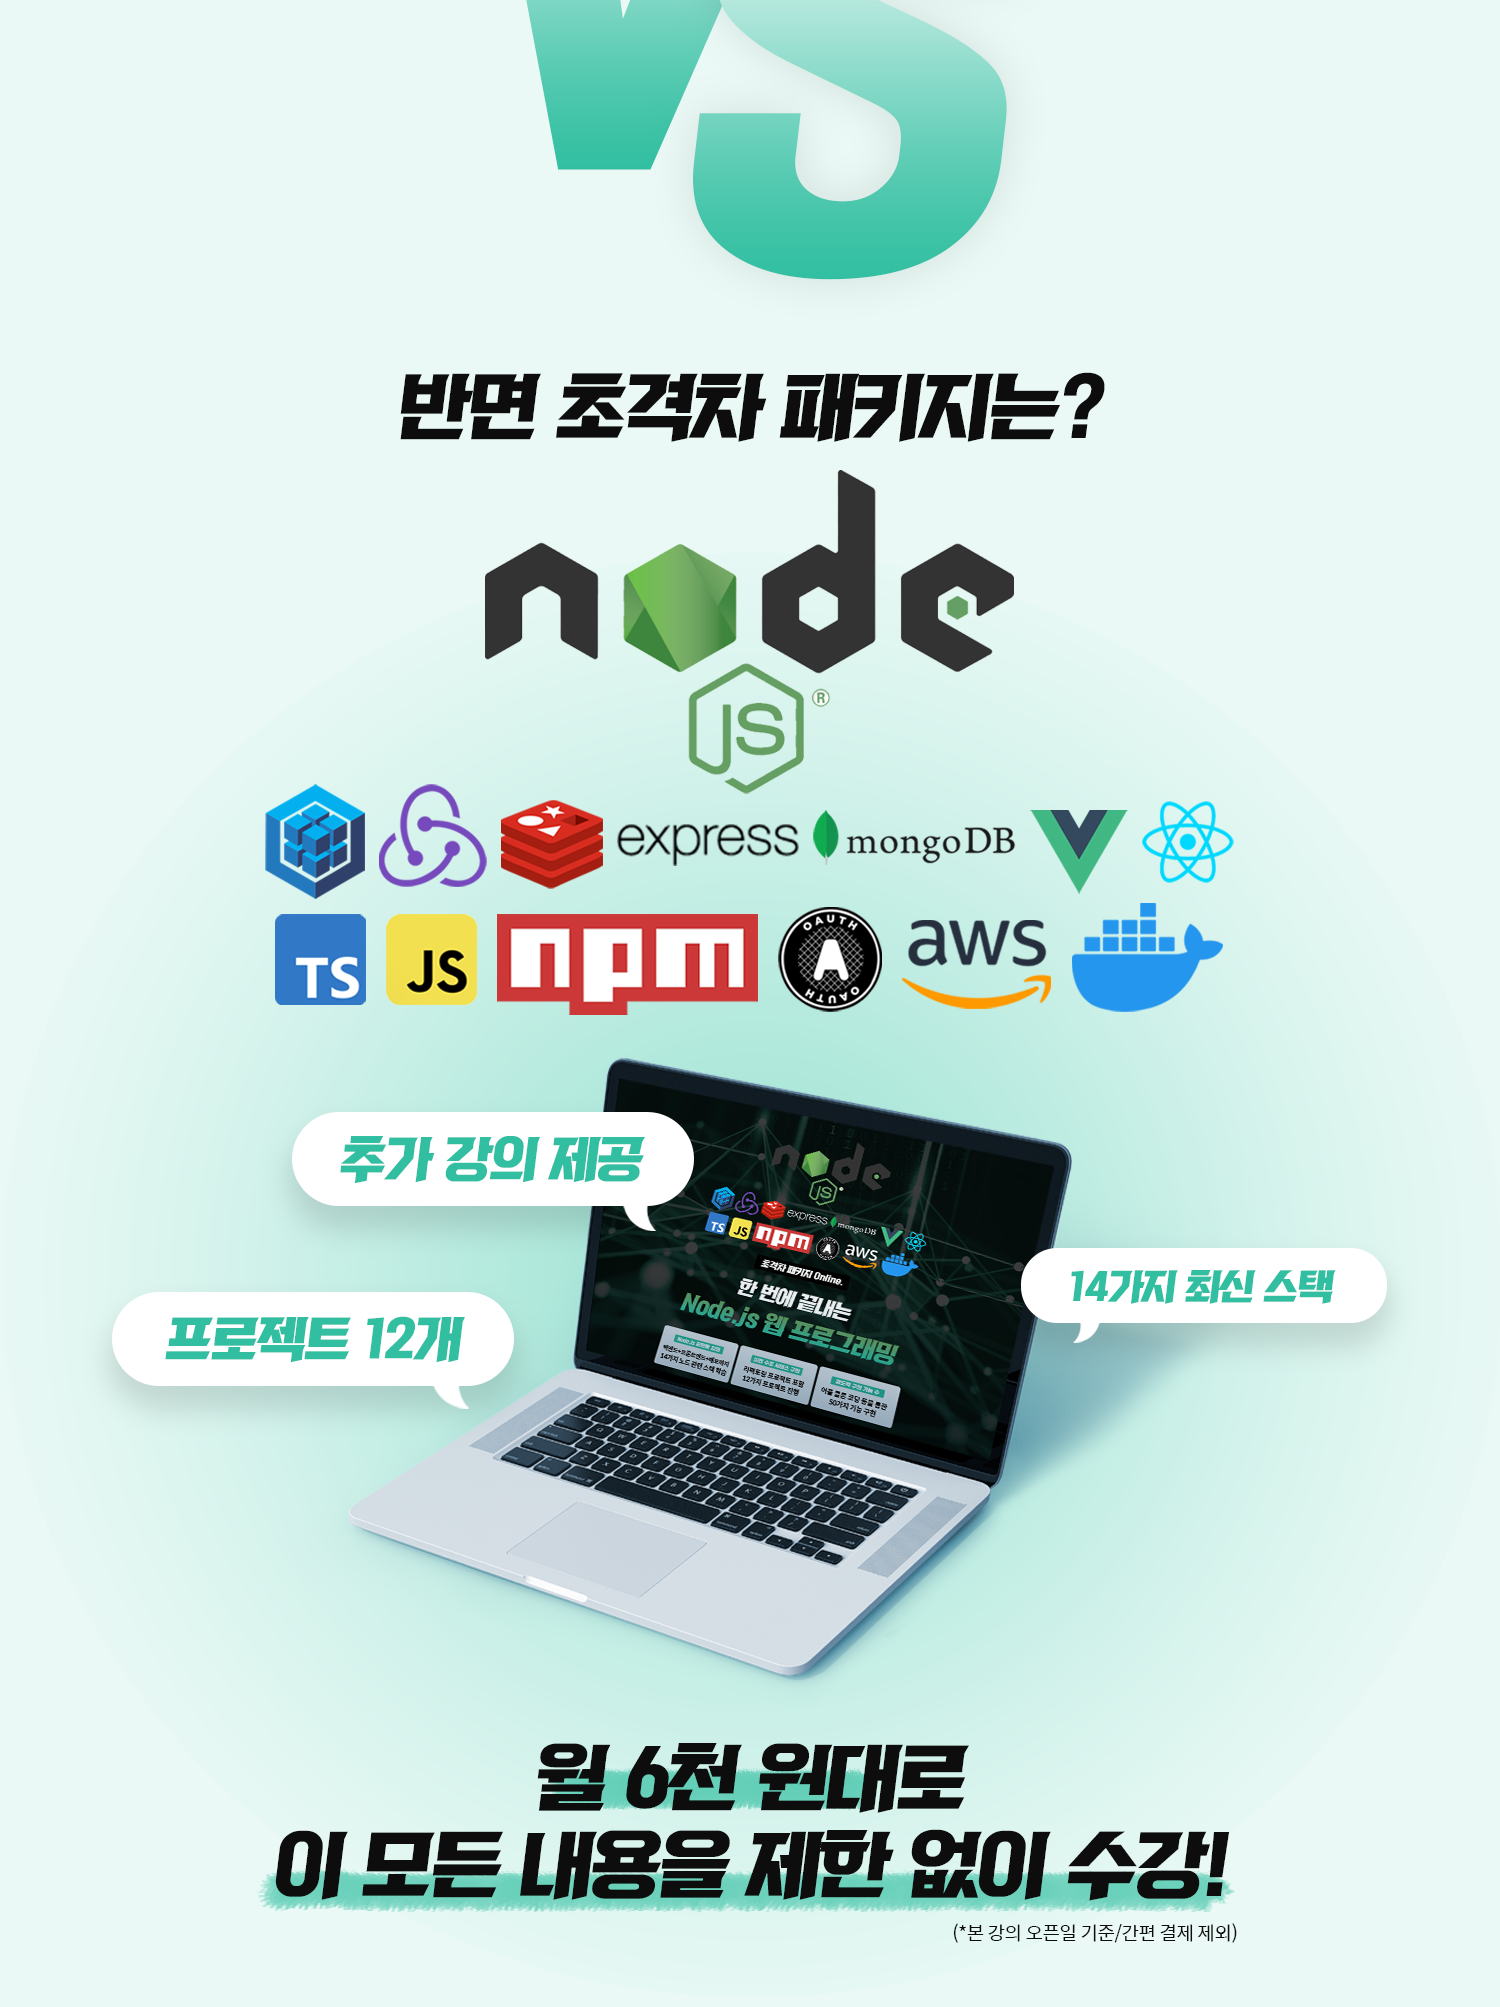 Node.js 노드 풀스택 프론트엔드 백엔드 프로그래밍 npm deno JavaScript TypeScript VS Code express.js react vue sequelize redis mongoDB redux oauto2.0 aws docker